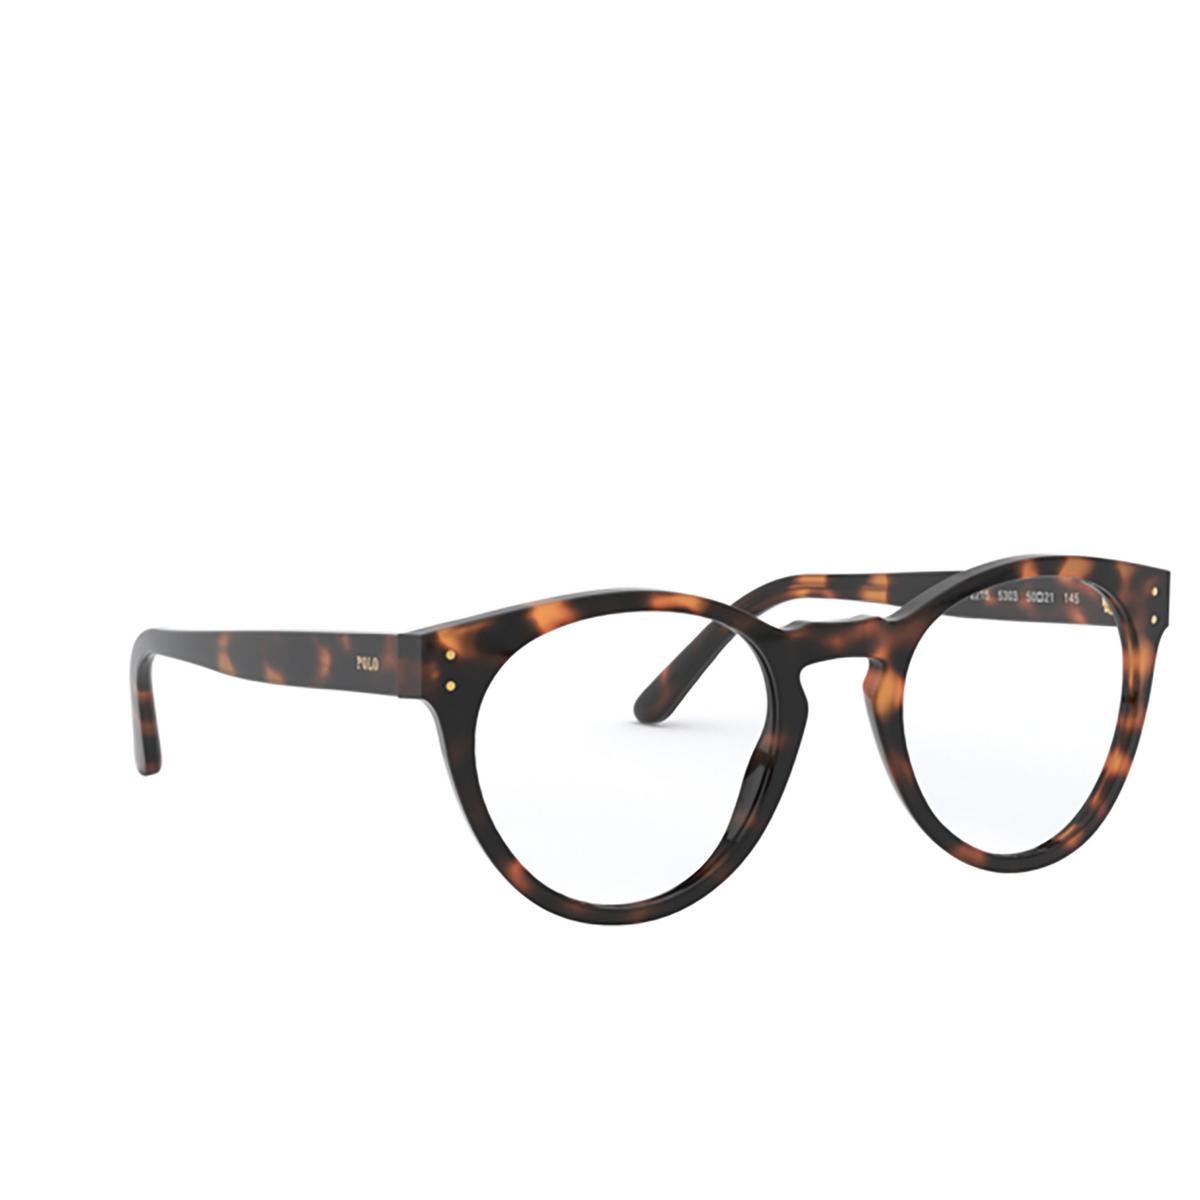 Polo Ralph Lauren® Round Eyeglasses: PH2215 color Shiny Jc Tortoise 5303 - three-quarters view.